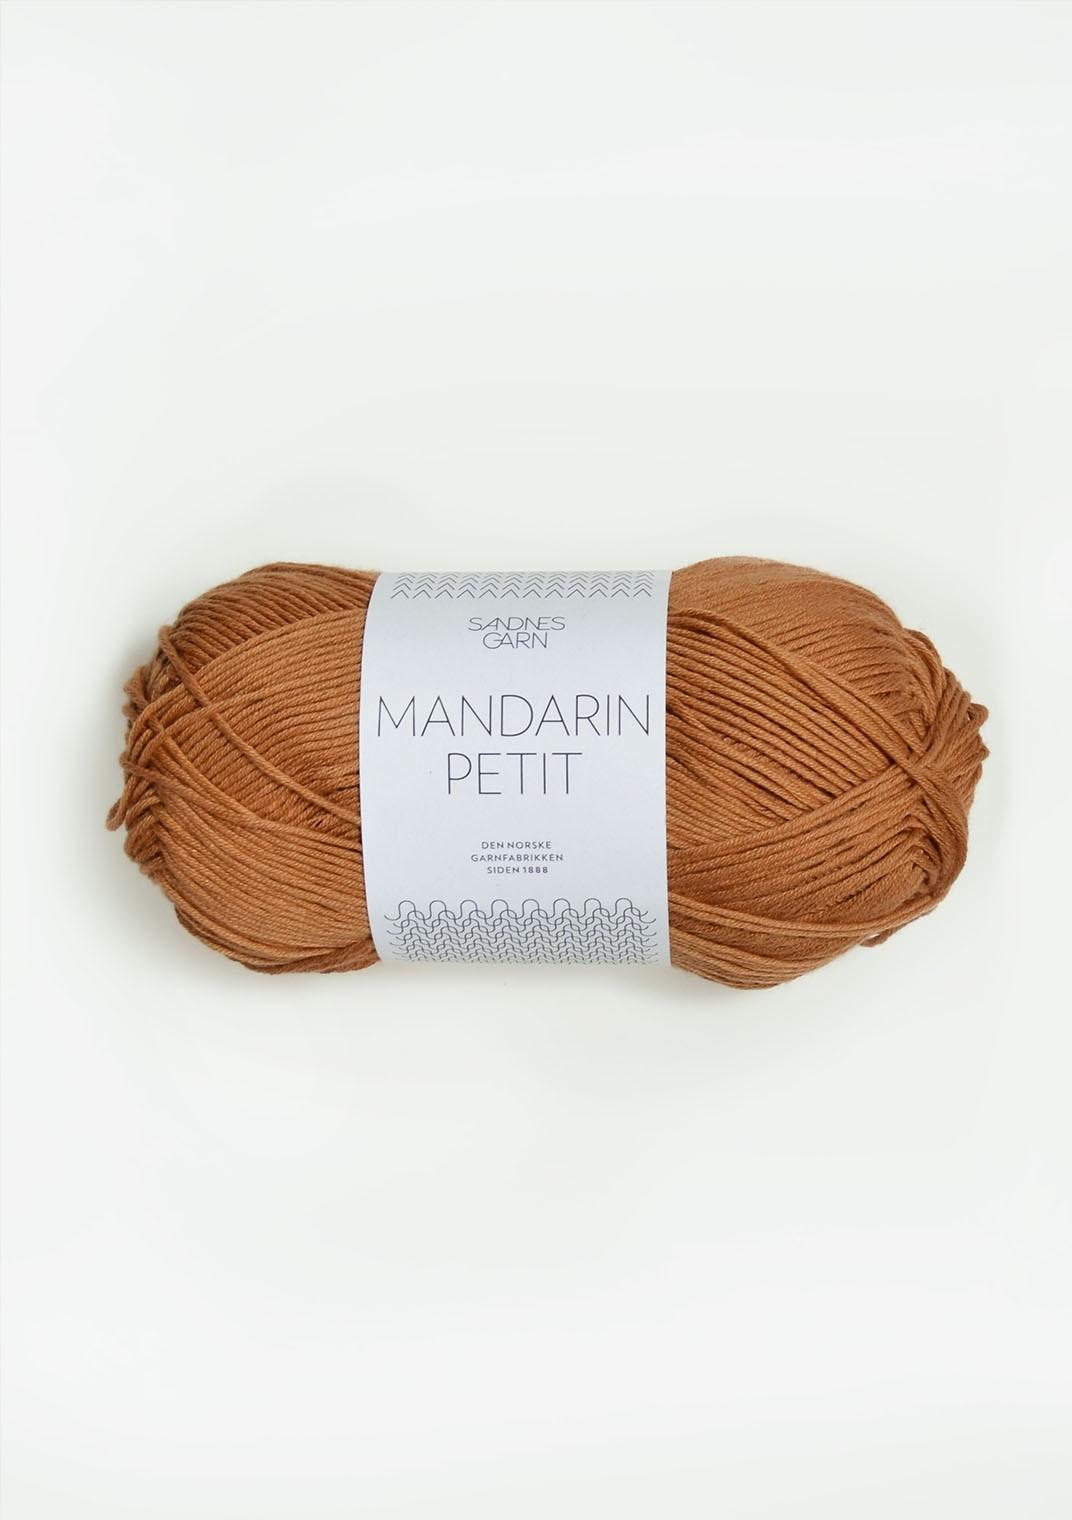 Mandarin petit 2534 gyllenbrun